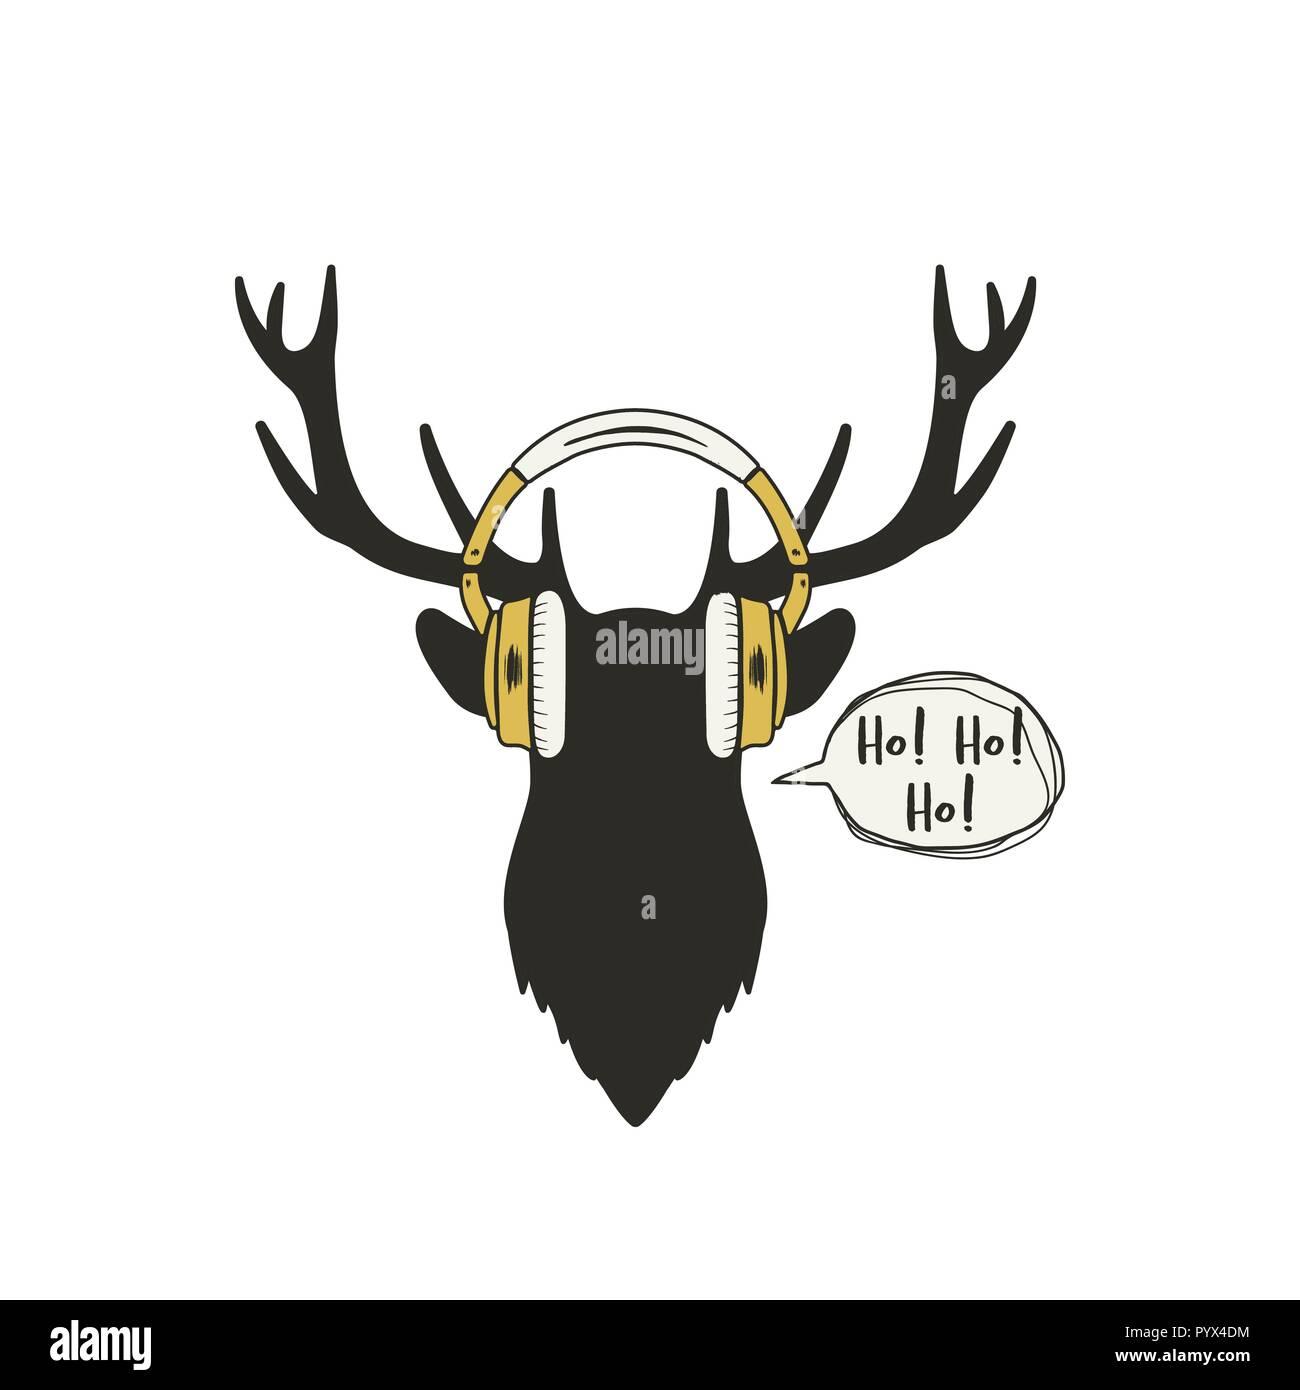 Vintage Hand Drawn Deer Head With Headphones Funny Silhouette Greeting Poster Reindeer Winter Holidays Emblem Stock Vector Illustration